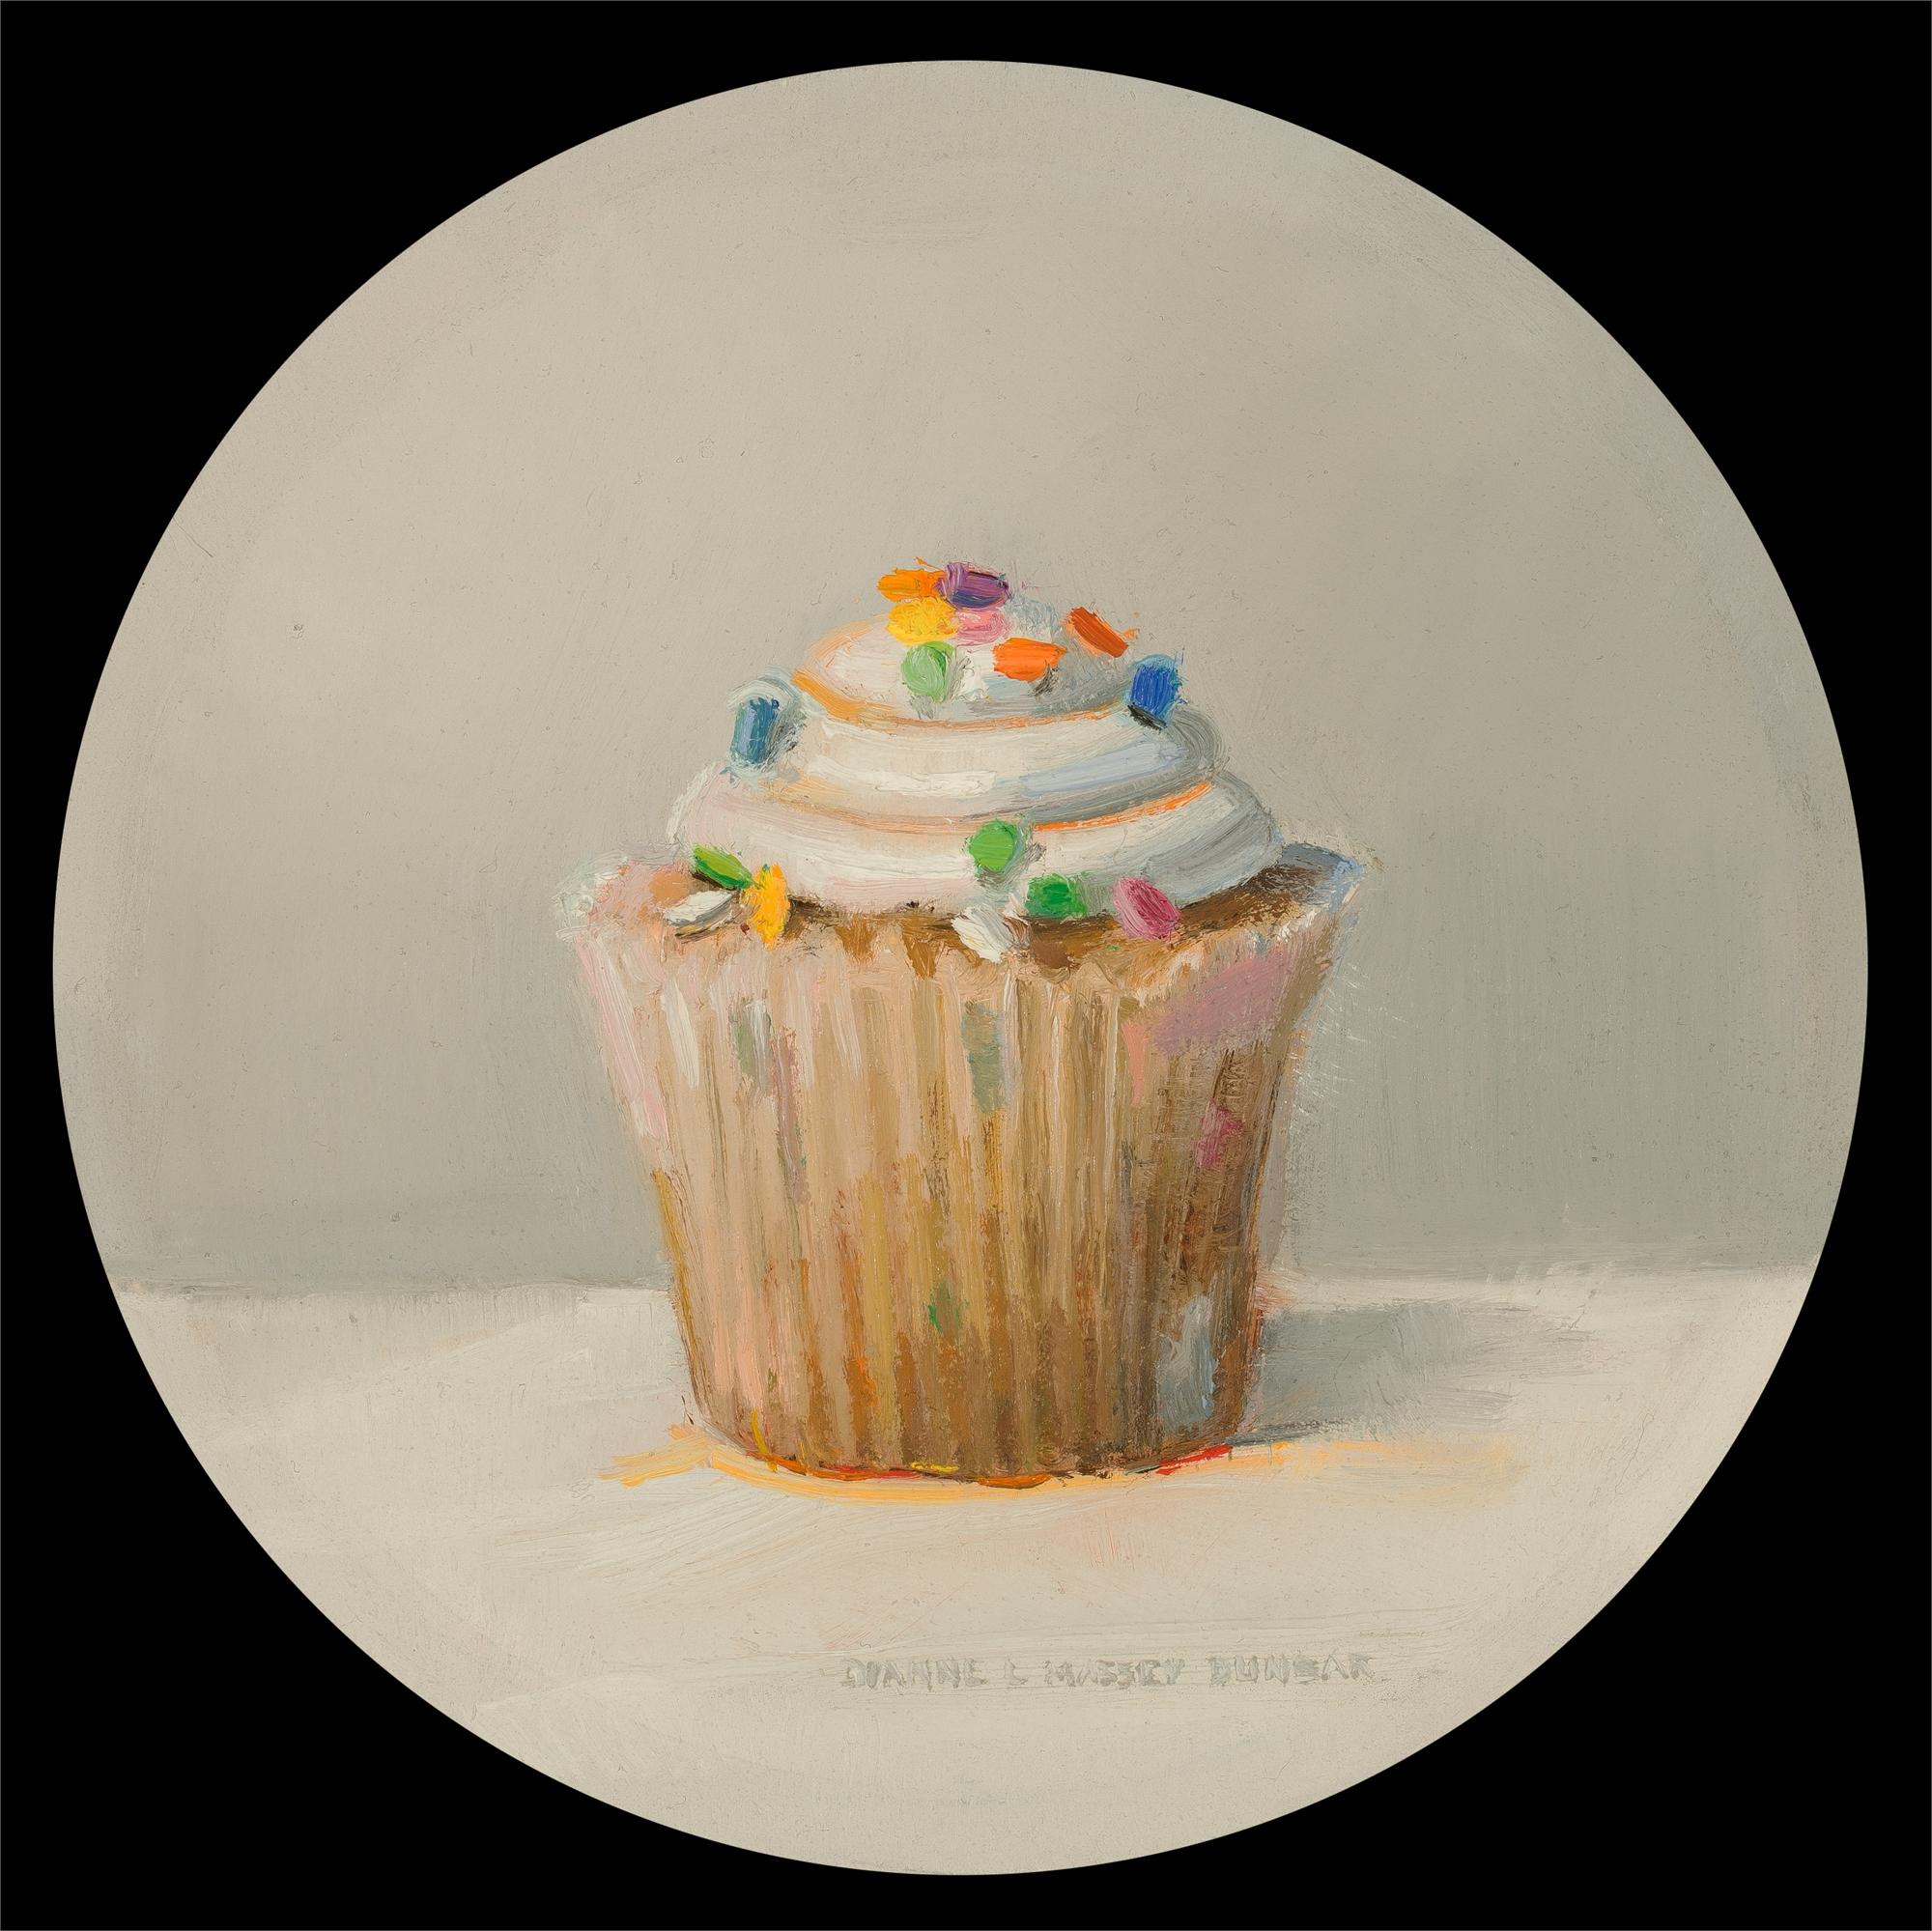 Cupcake by Dianne L Massey Dunbar